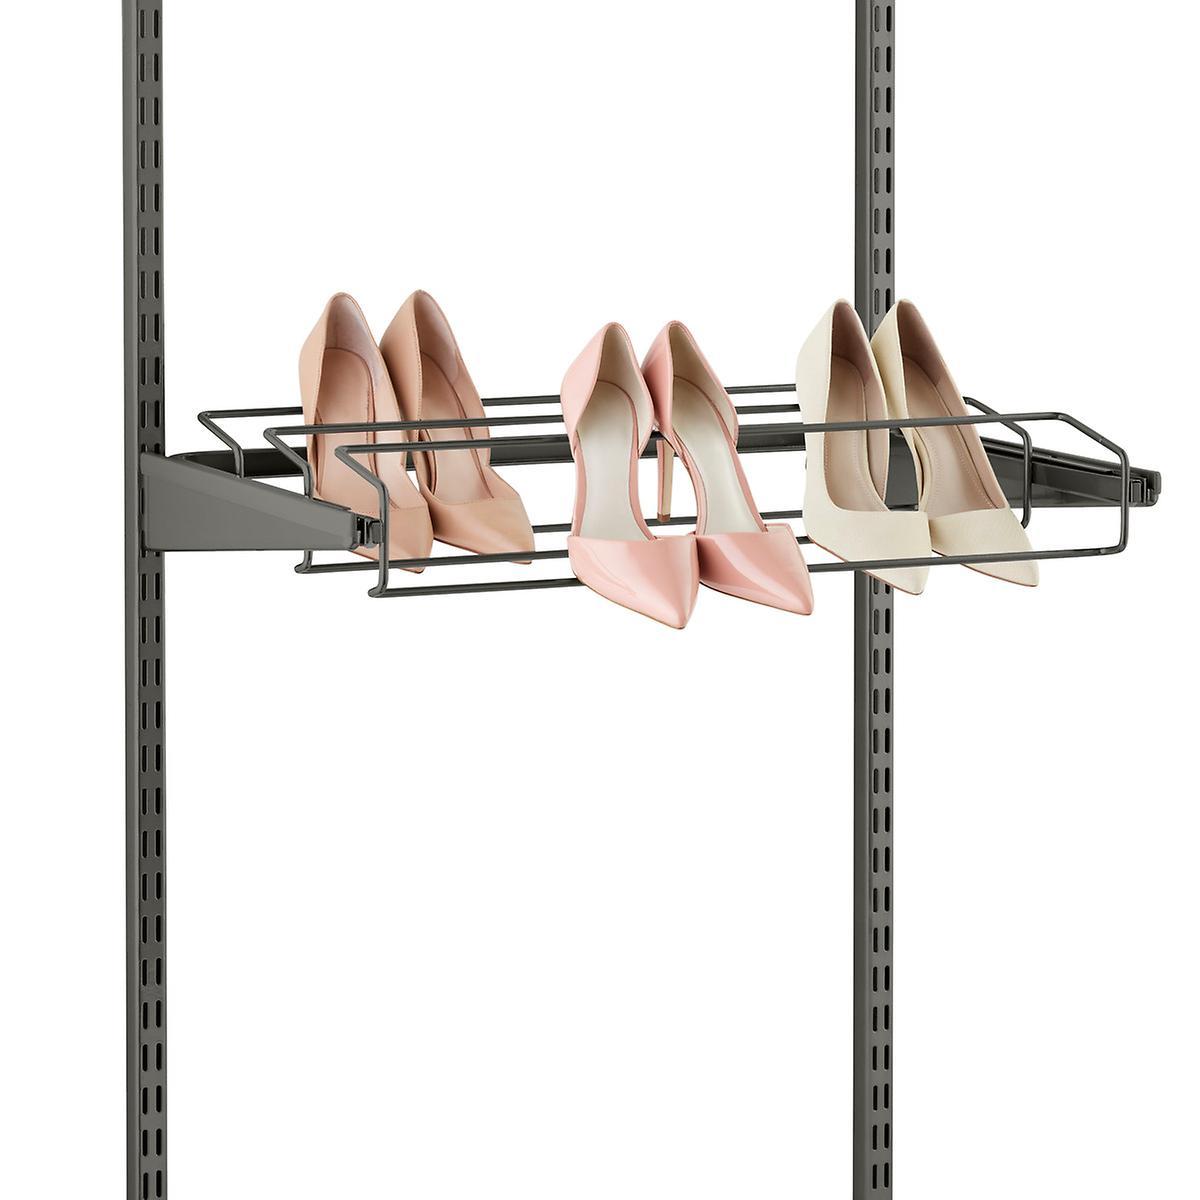 Graphite Elfa Gliding Shoe Racks